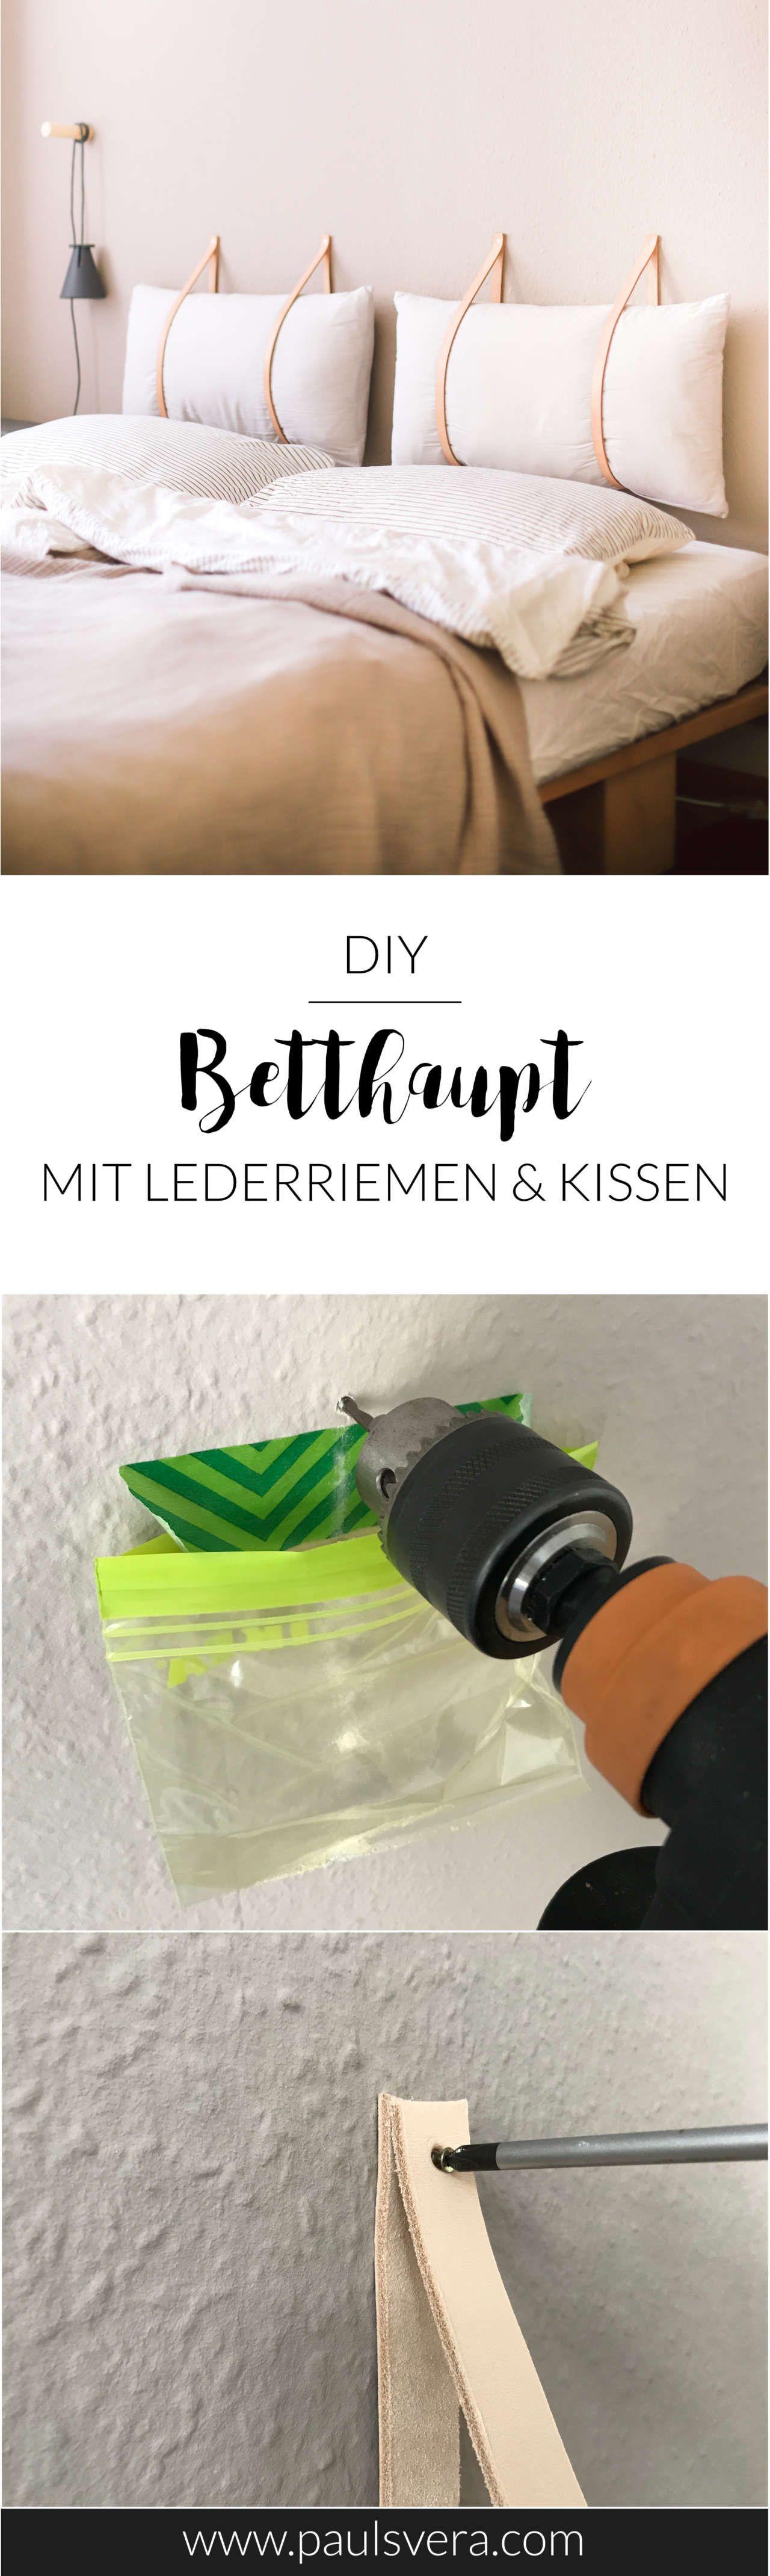 DIY Betthaupt mit Lederriemen